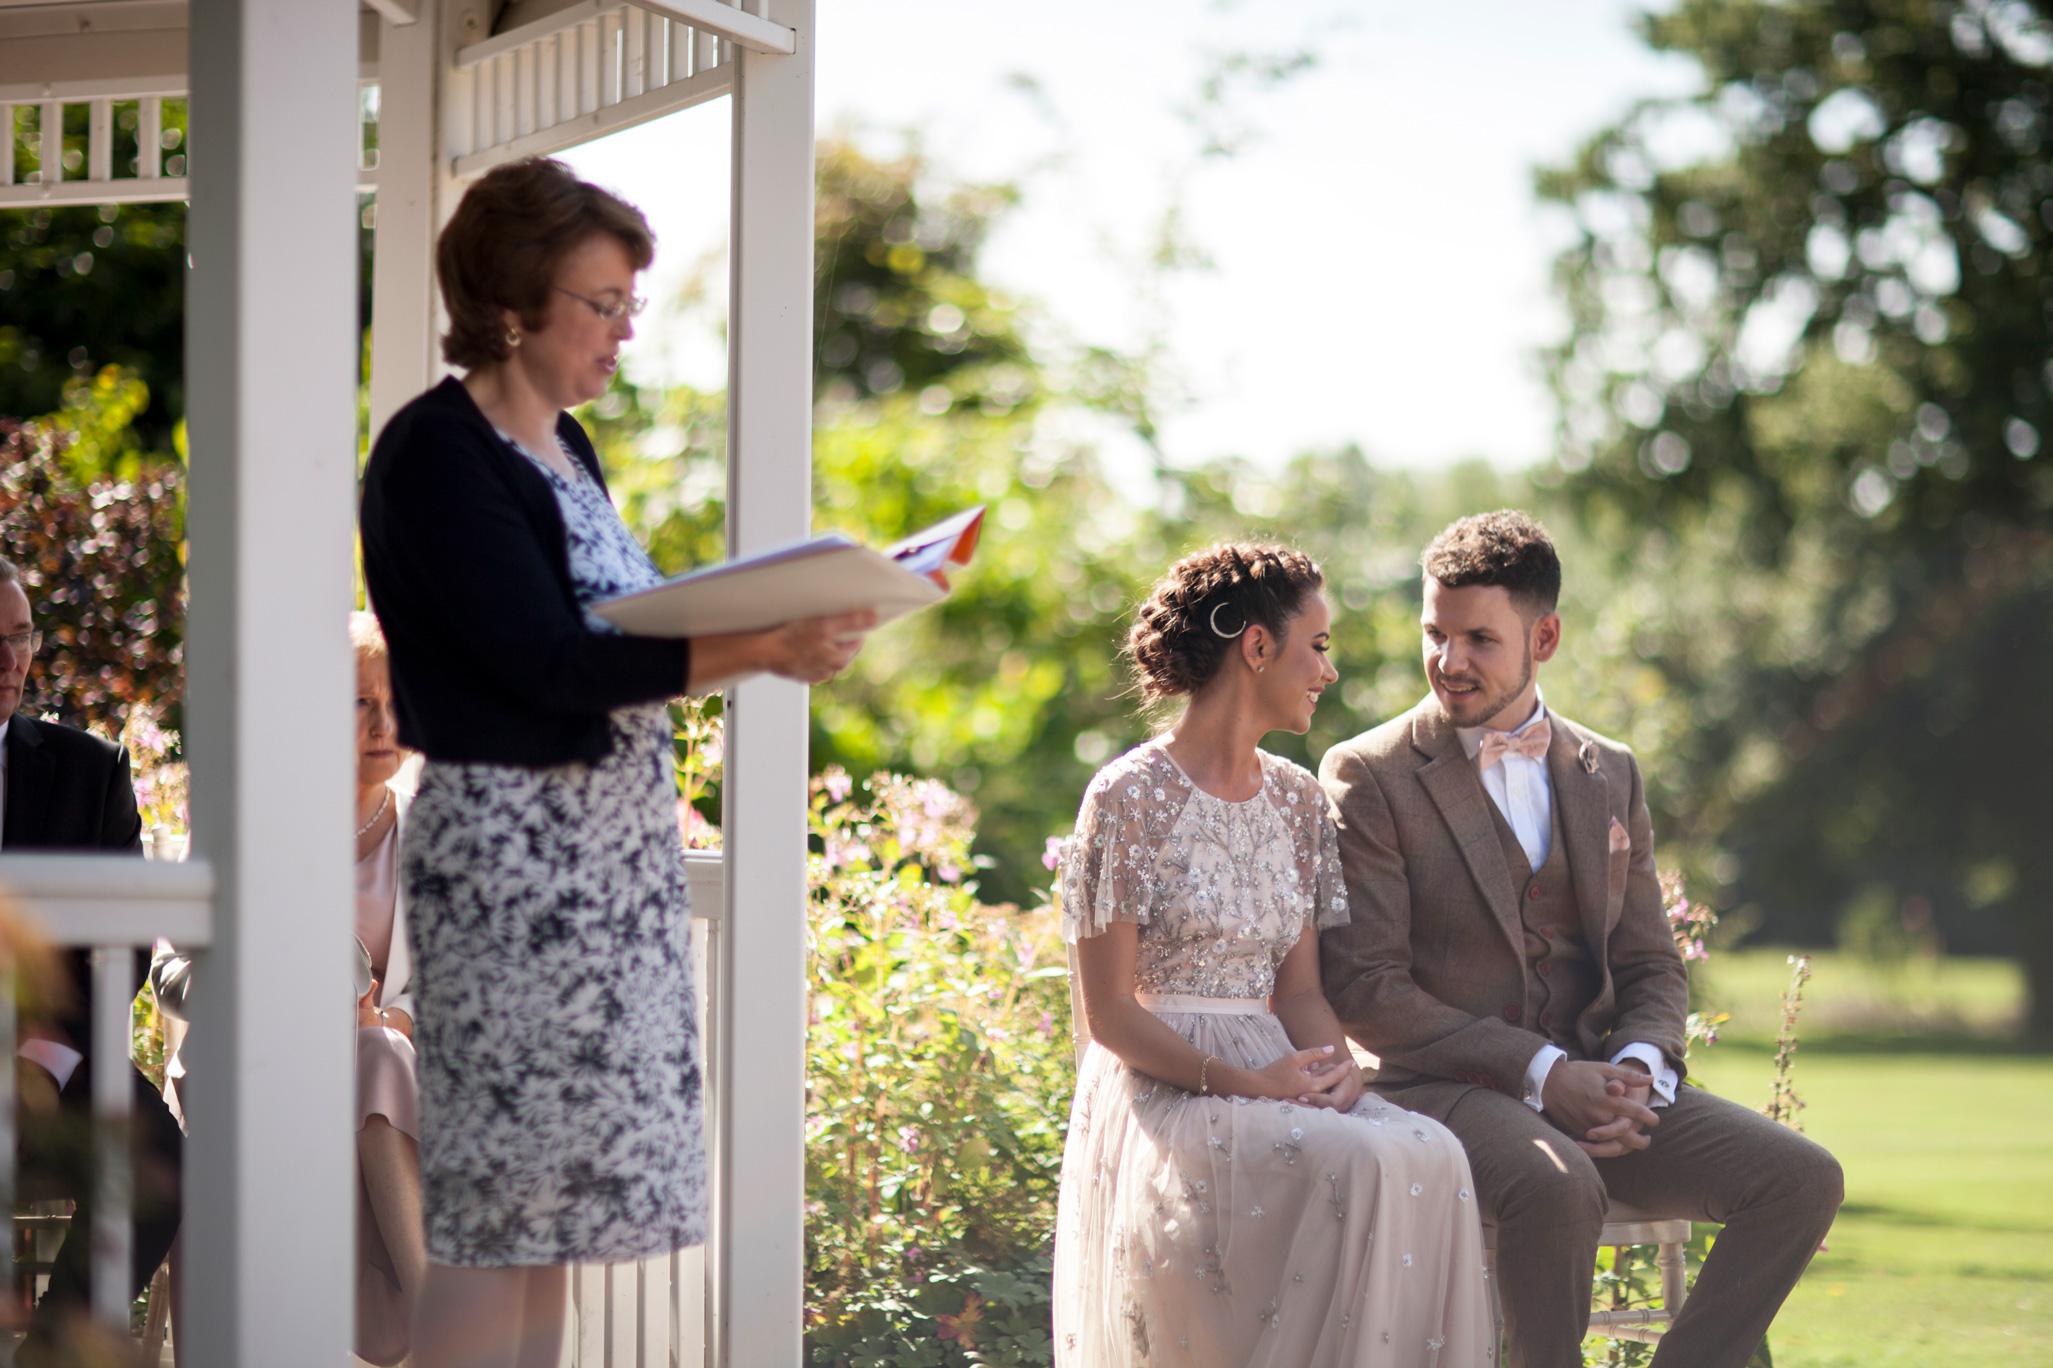 outside ceremony, Horwood house, couple, bride, groom, summer wedding, buckinghamshire wedding,